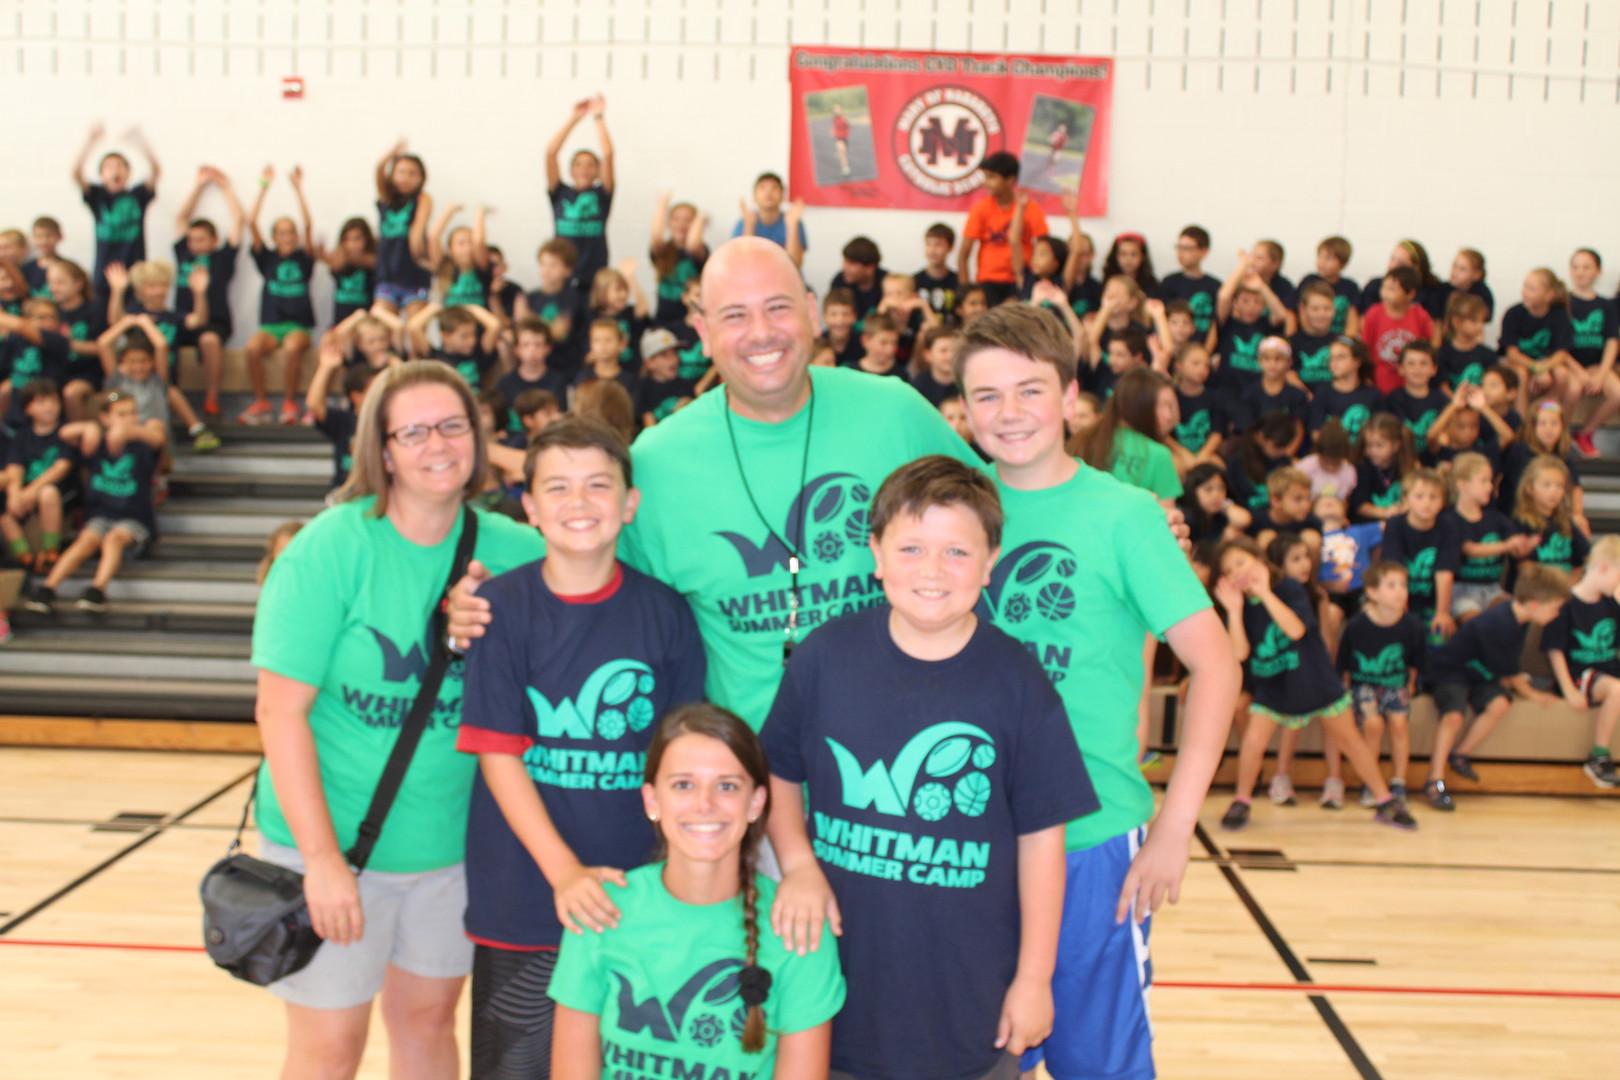 Whitman Summer Camp - Whitman Family Pic 2016